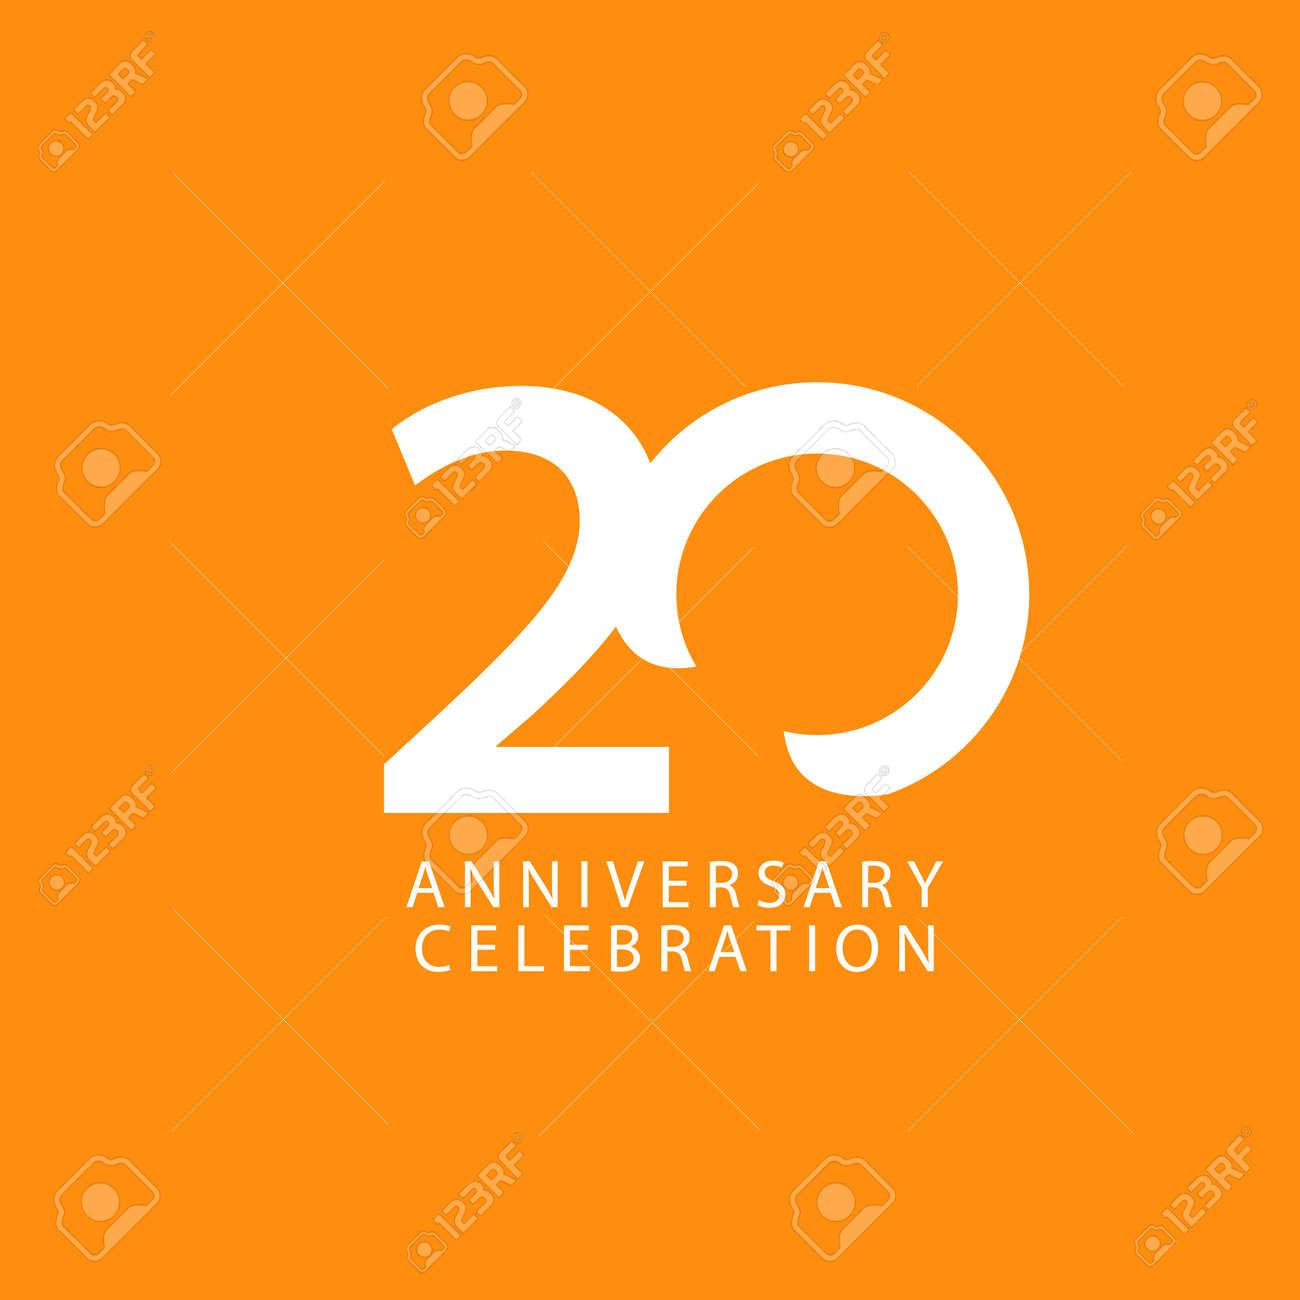 20 Years Anniversary Celebration Vector Template Design Illustration - 163698084